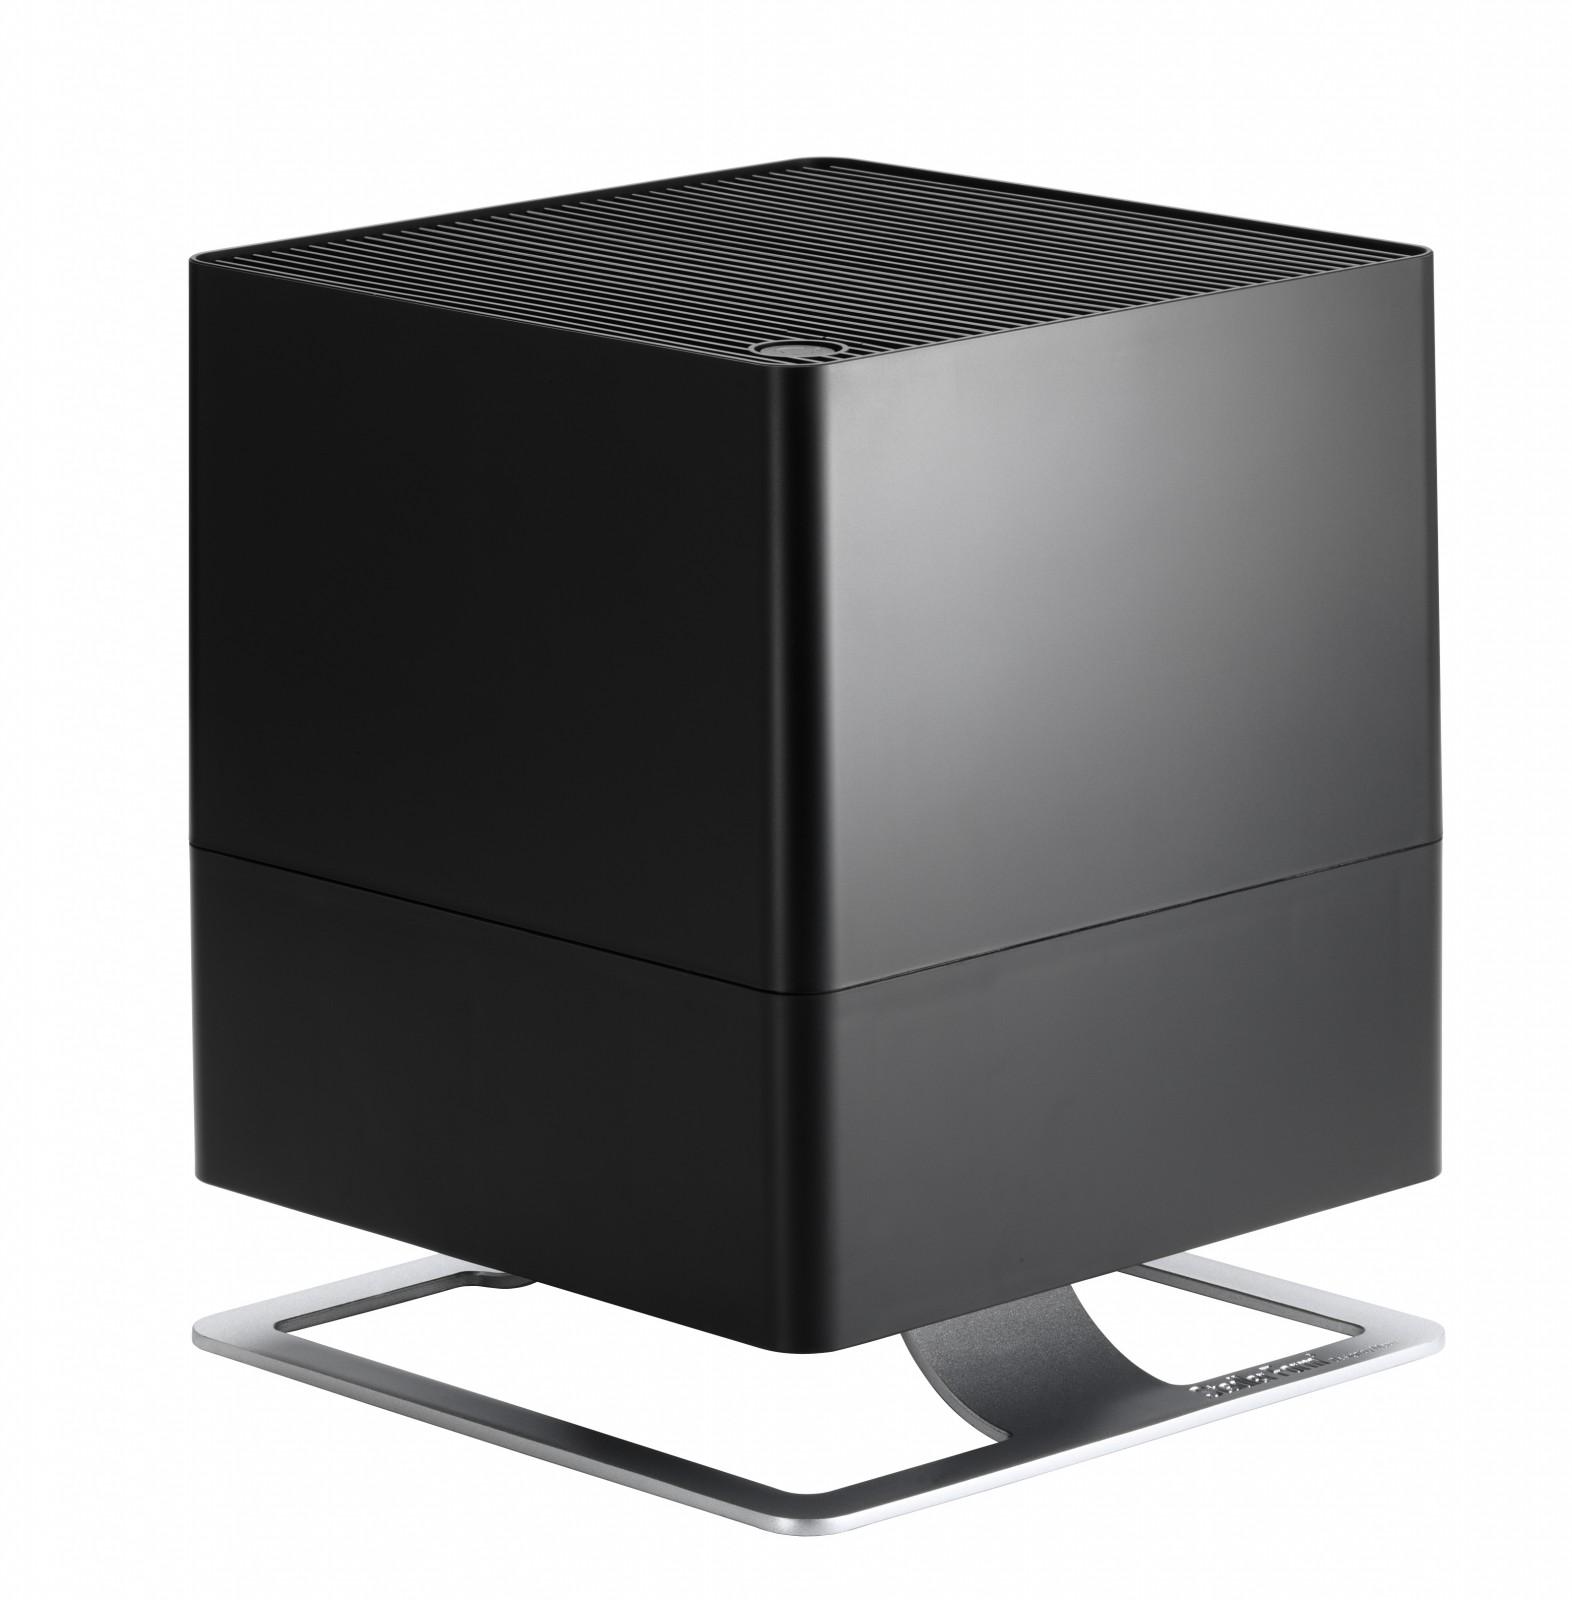 Humidifier Oskar black to 50 m ² Room size Humidification: 370 g/h  #545658